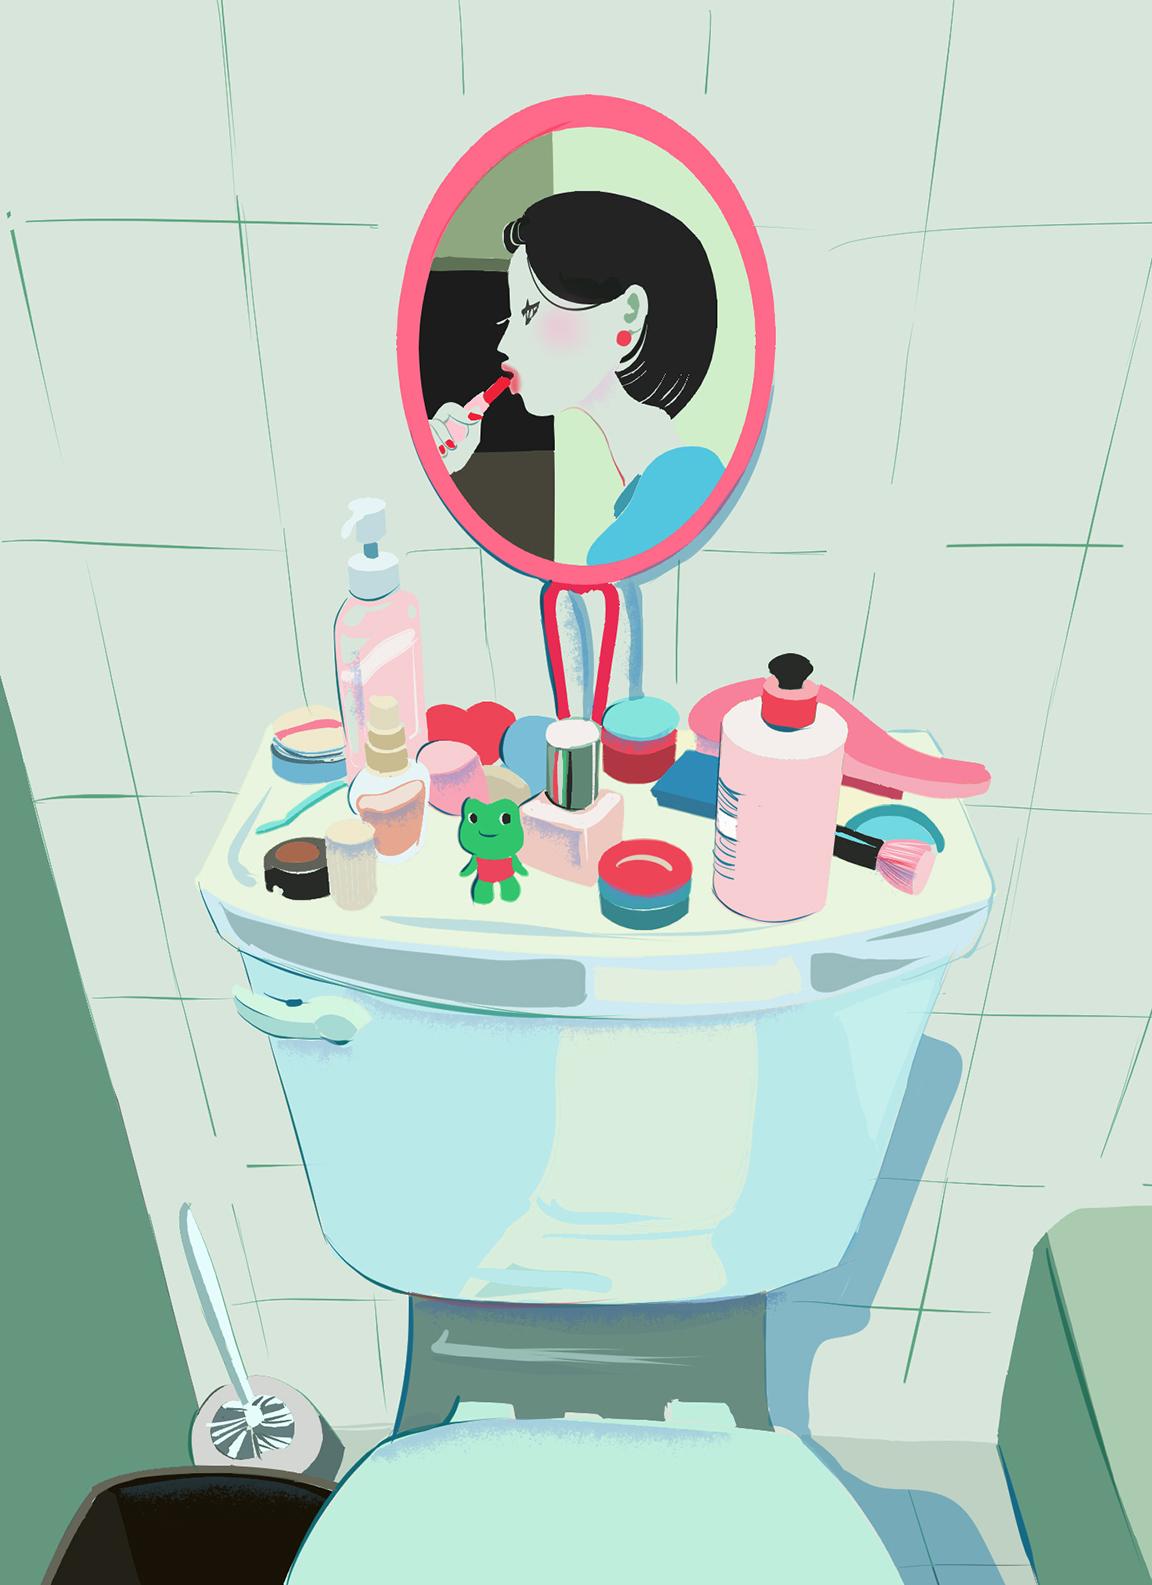 GirlsclubAsia-Illustrator-Eve Liu-File18